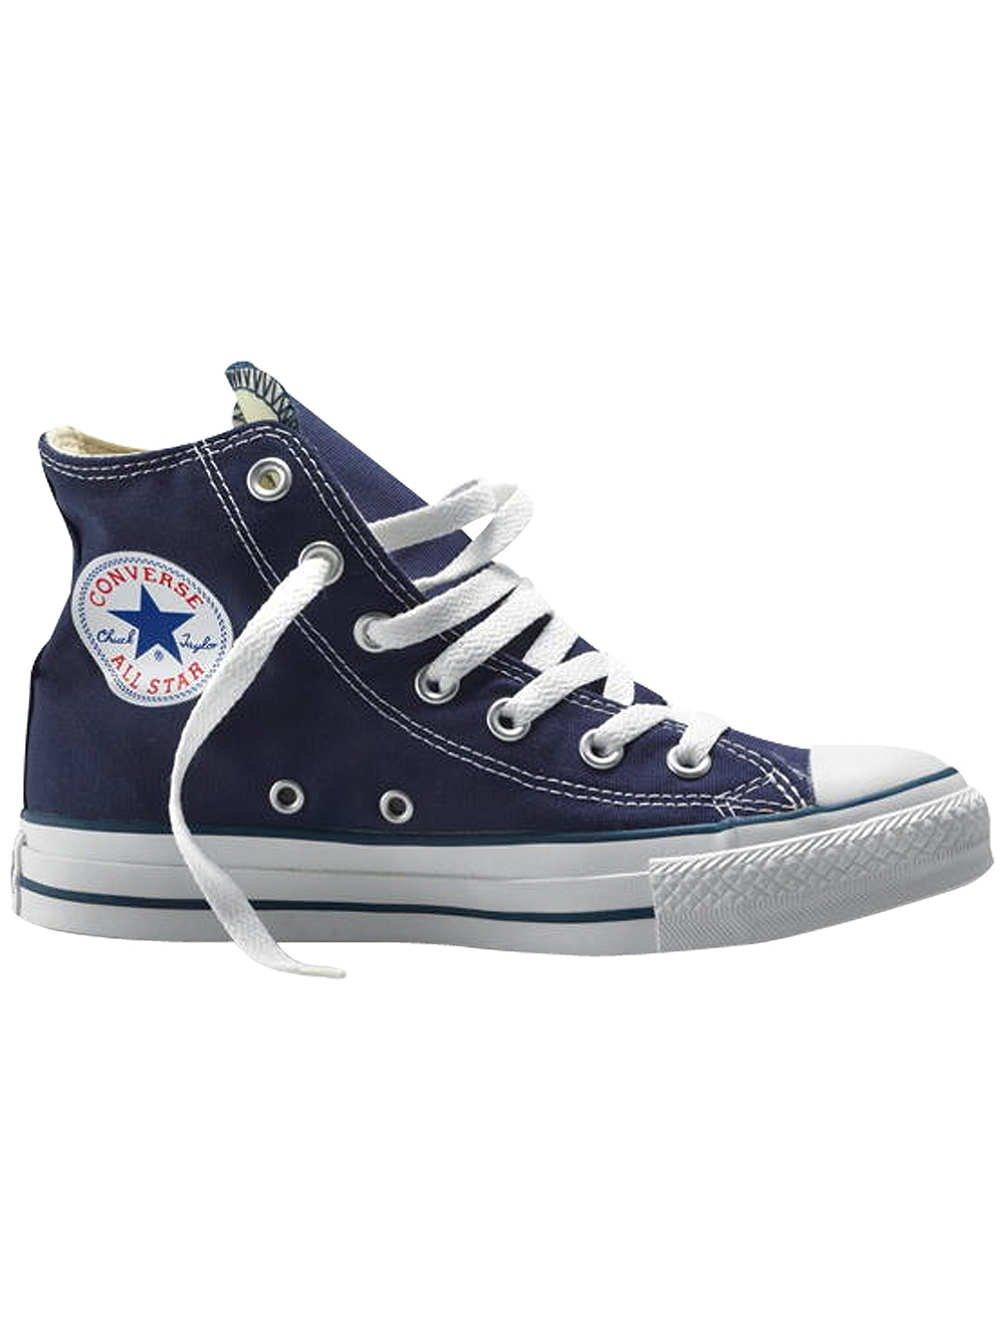 Converse - Ctas Core Hi, Sneaker Unisex - Adulto, Blu (Blau/navy), 39 1/9